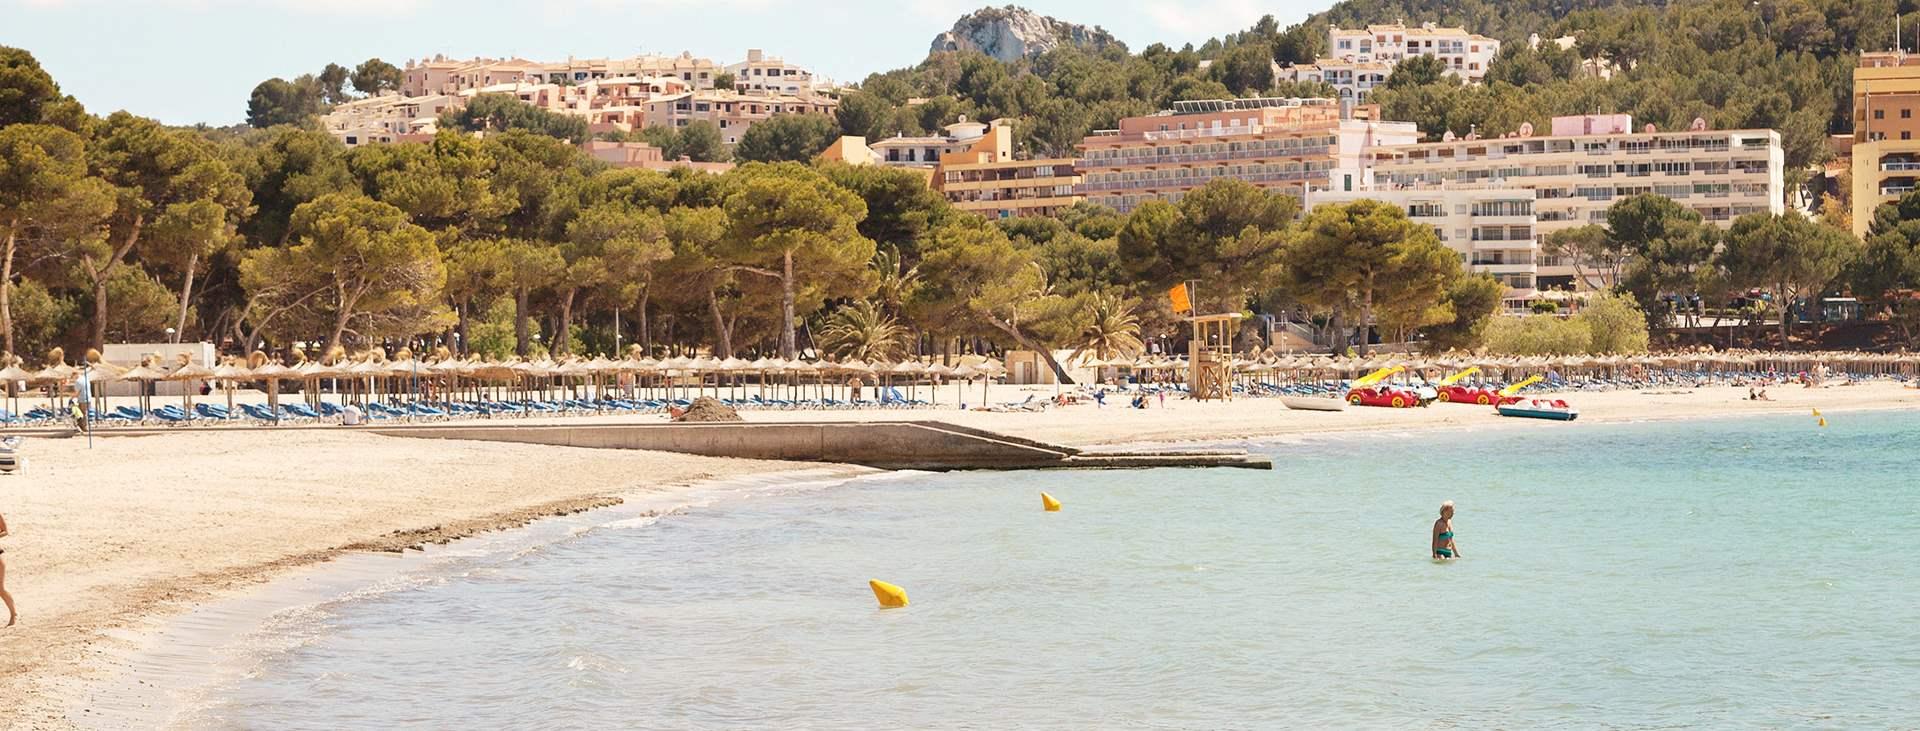 Bestill en reise med All Inclusive til Santa Ponsa på Mallorca